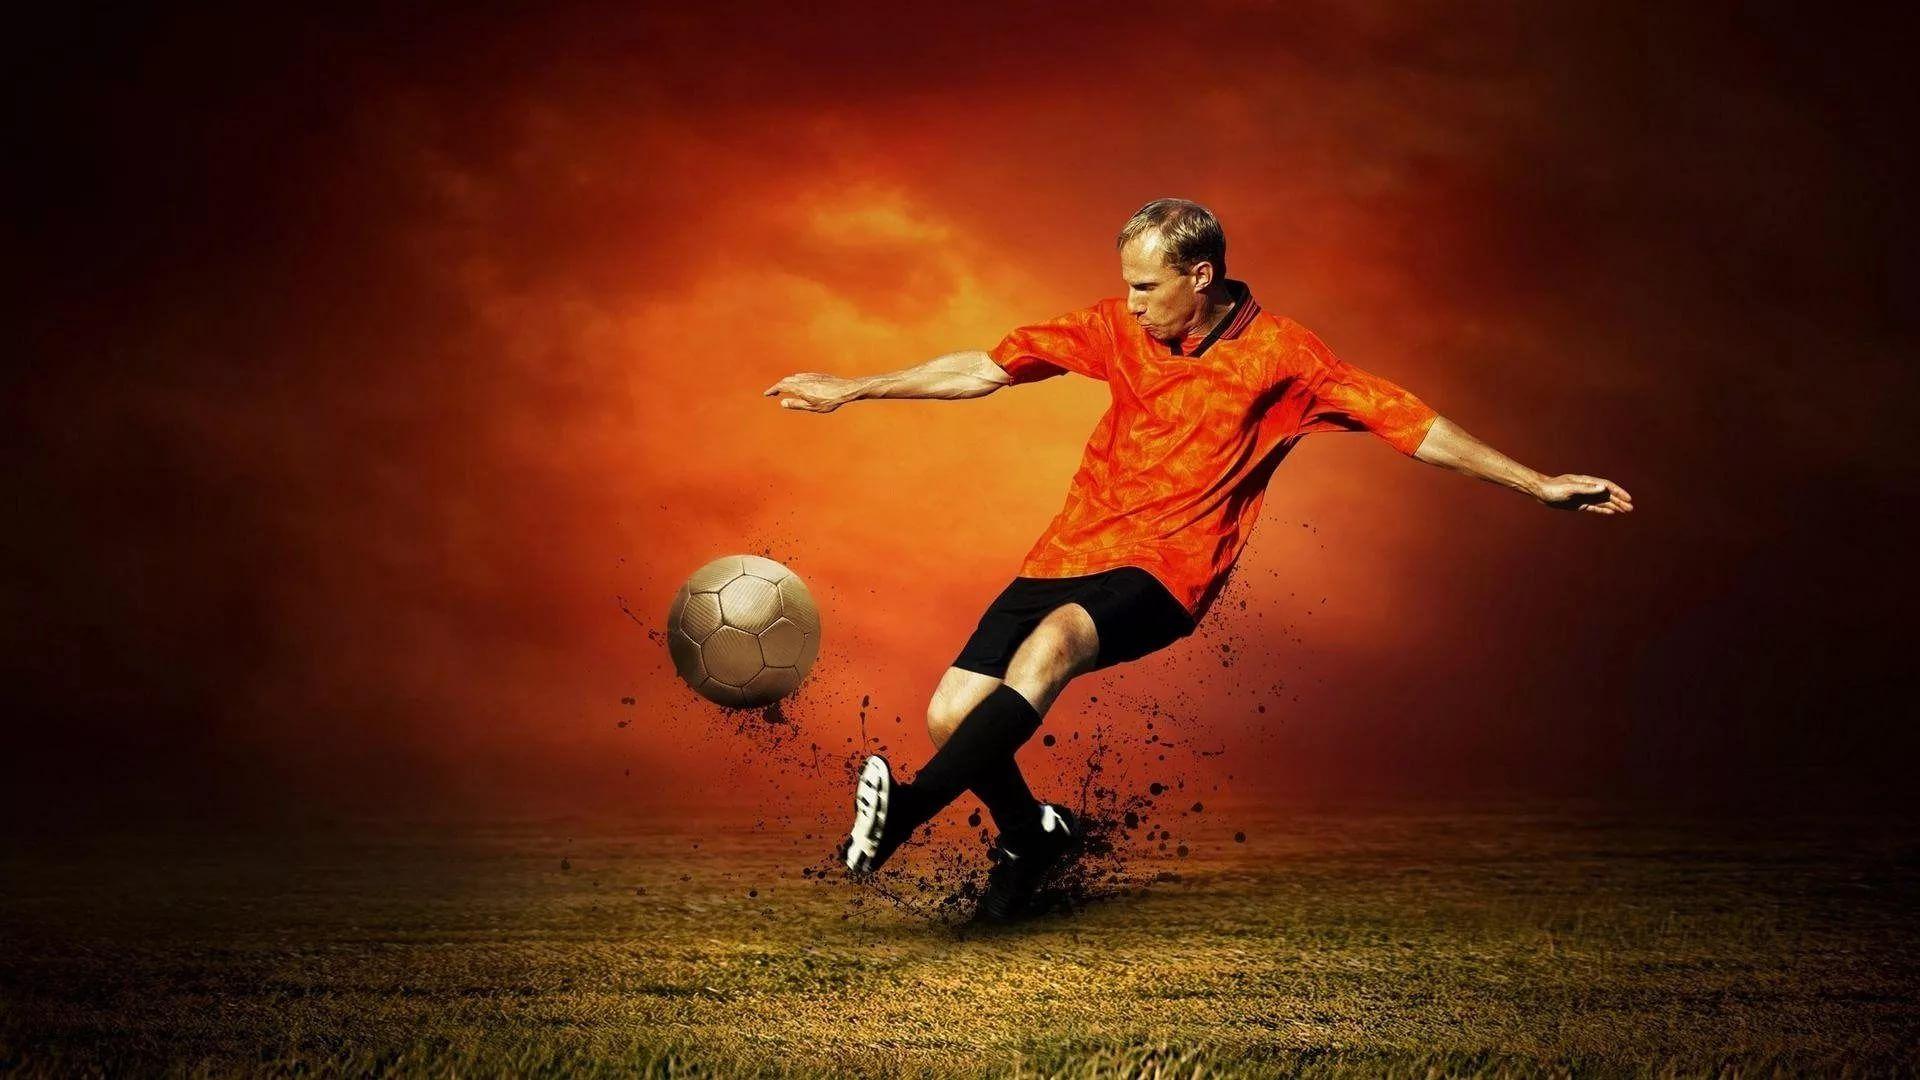 Soccer Player good wallpaper